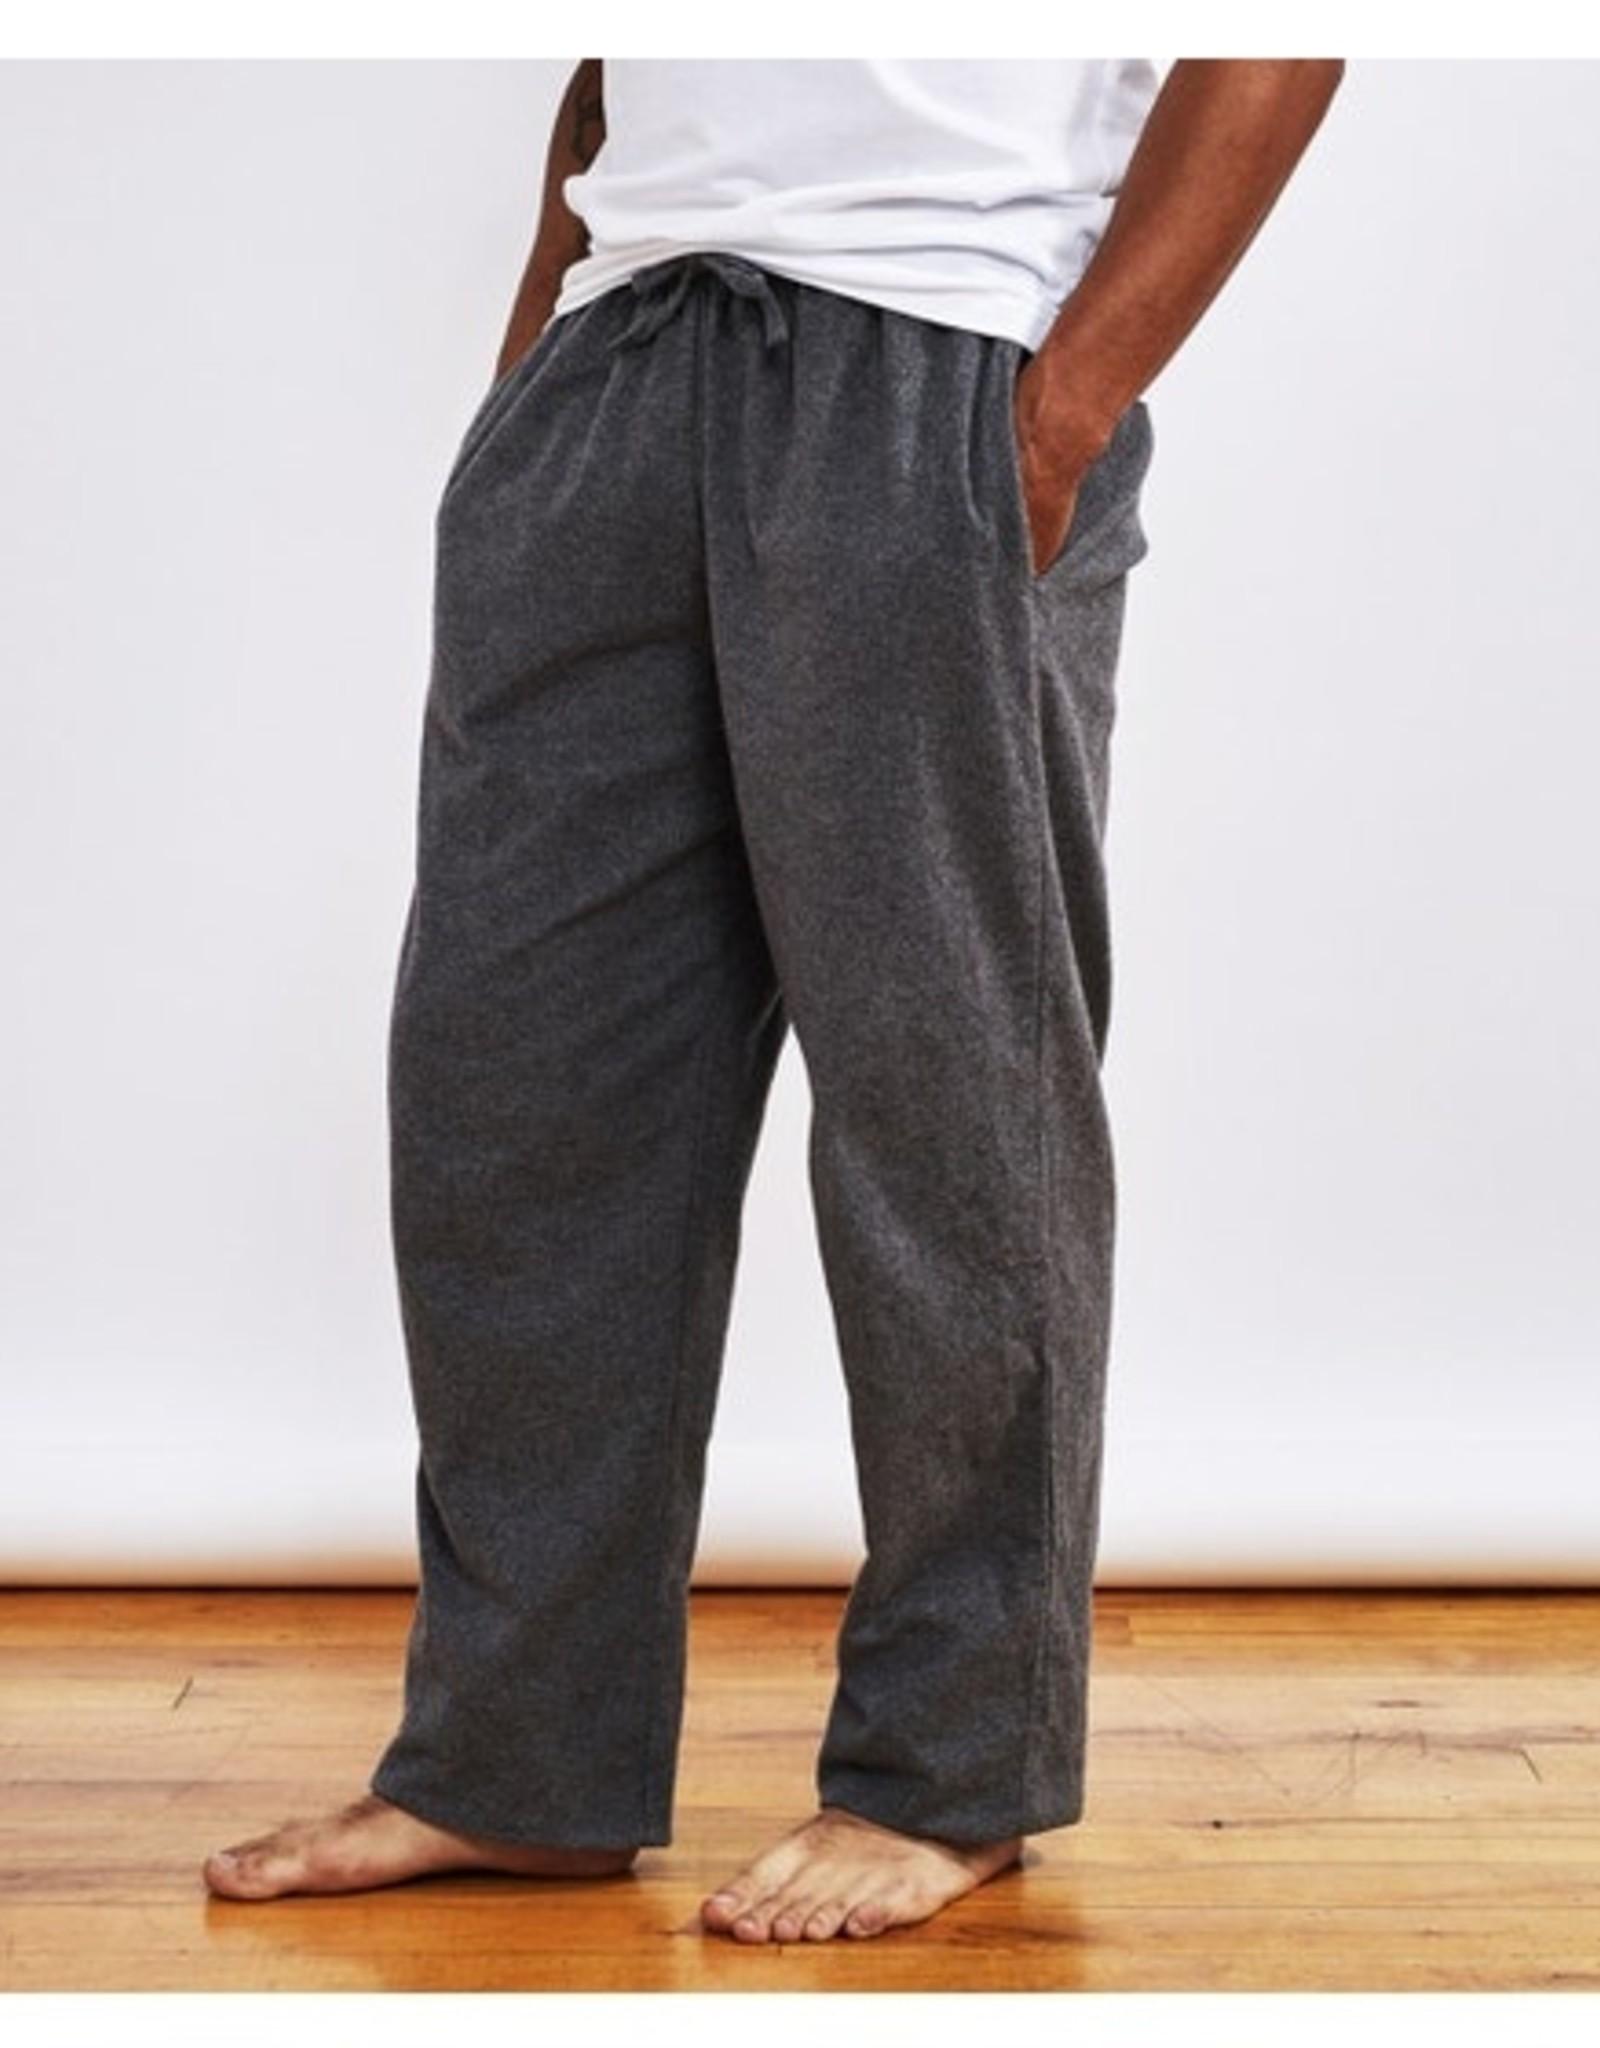 Men's Gray Flannel Pajama Pants - Small